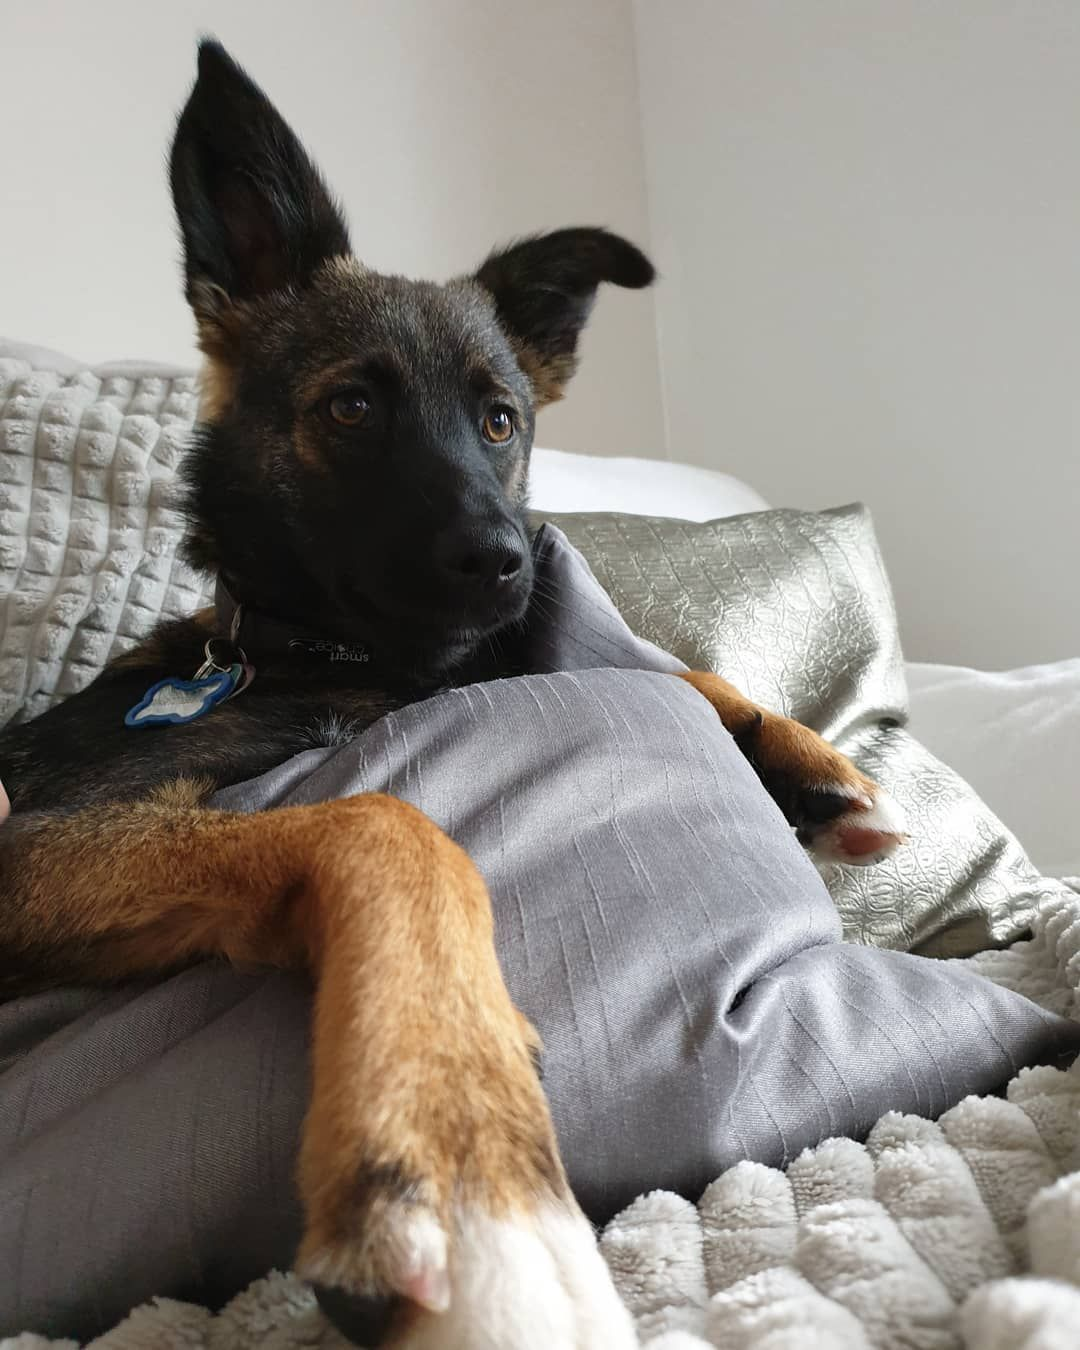 Sunday Chilling Minimissdakota Gsdmix Gsdpuppies Photooftheday Pictureoftheday Dogstagram Dogs Of Instagram Doggo Dogoftheday Dogso Animals Dogs